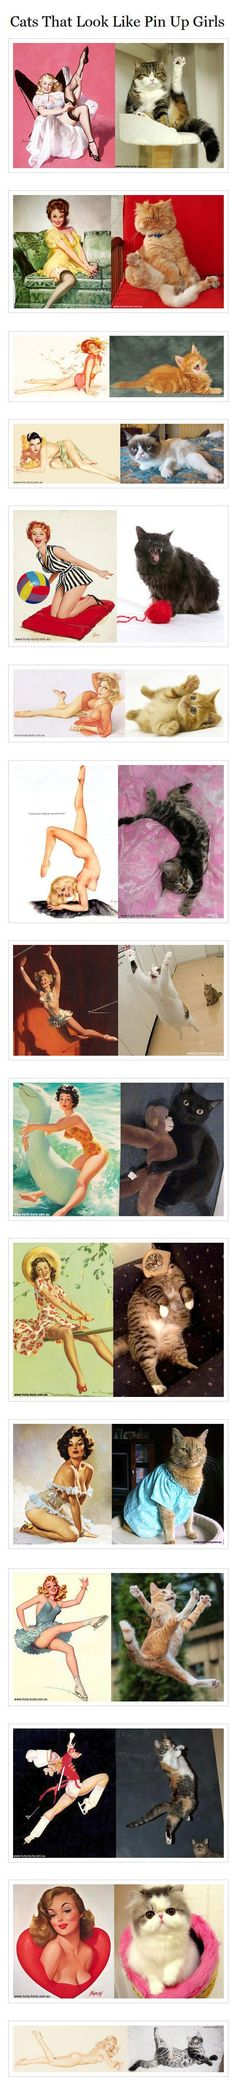 Pin up cats